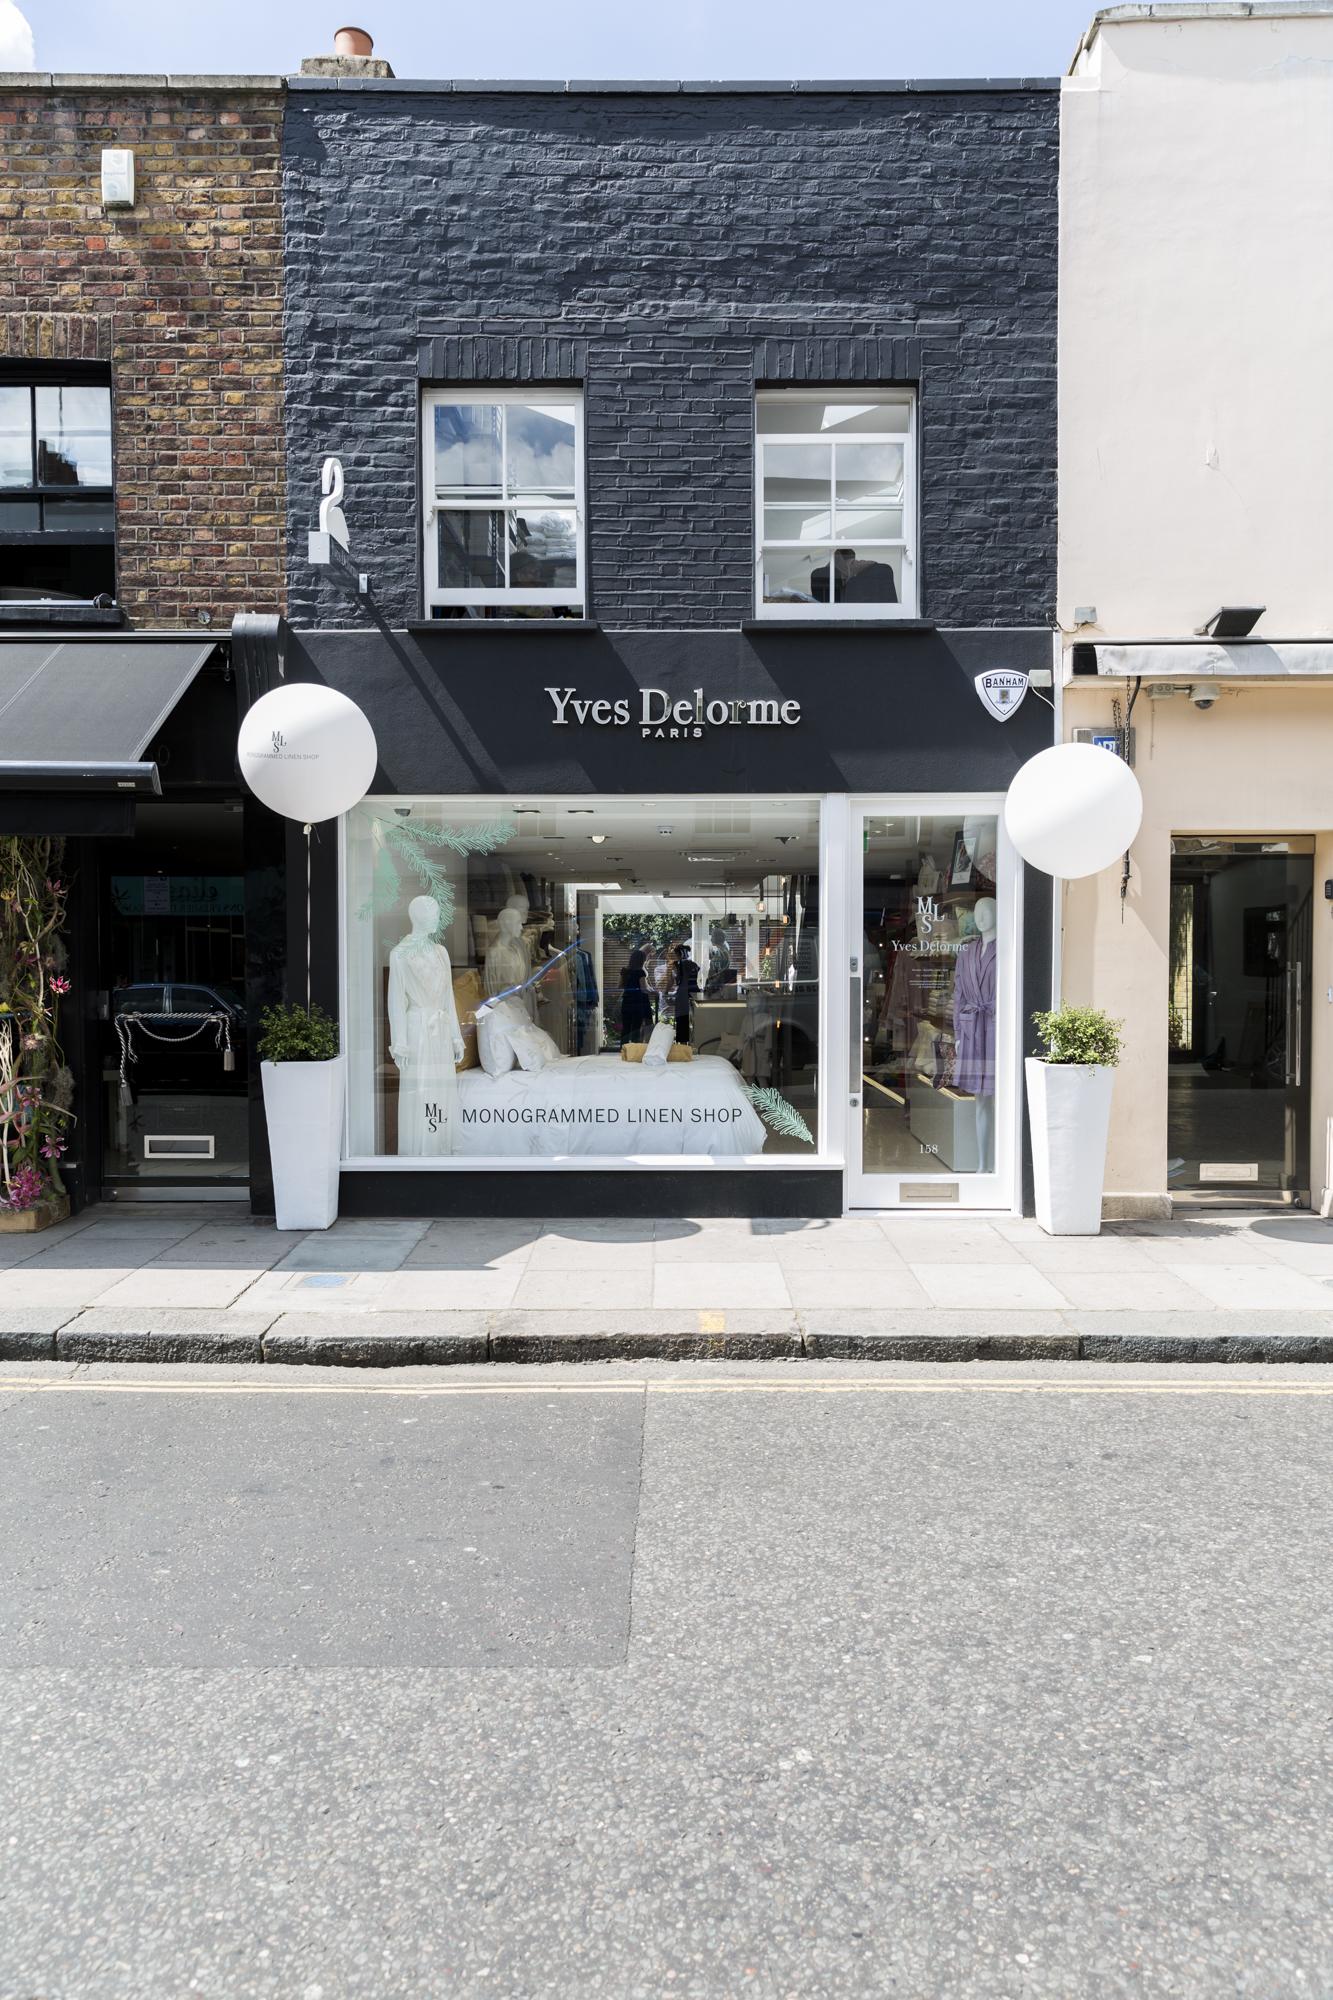 The Yves Delorme Monogrammed linen shop, 158 Walton Street, London.